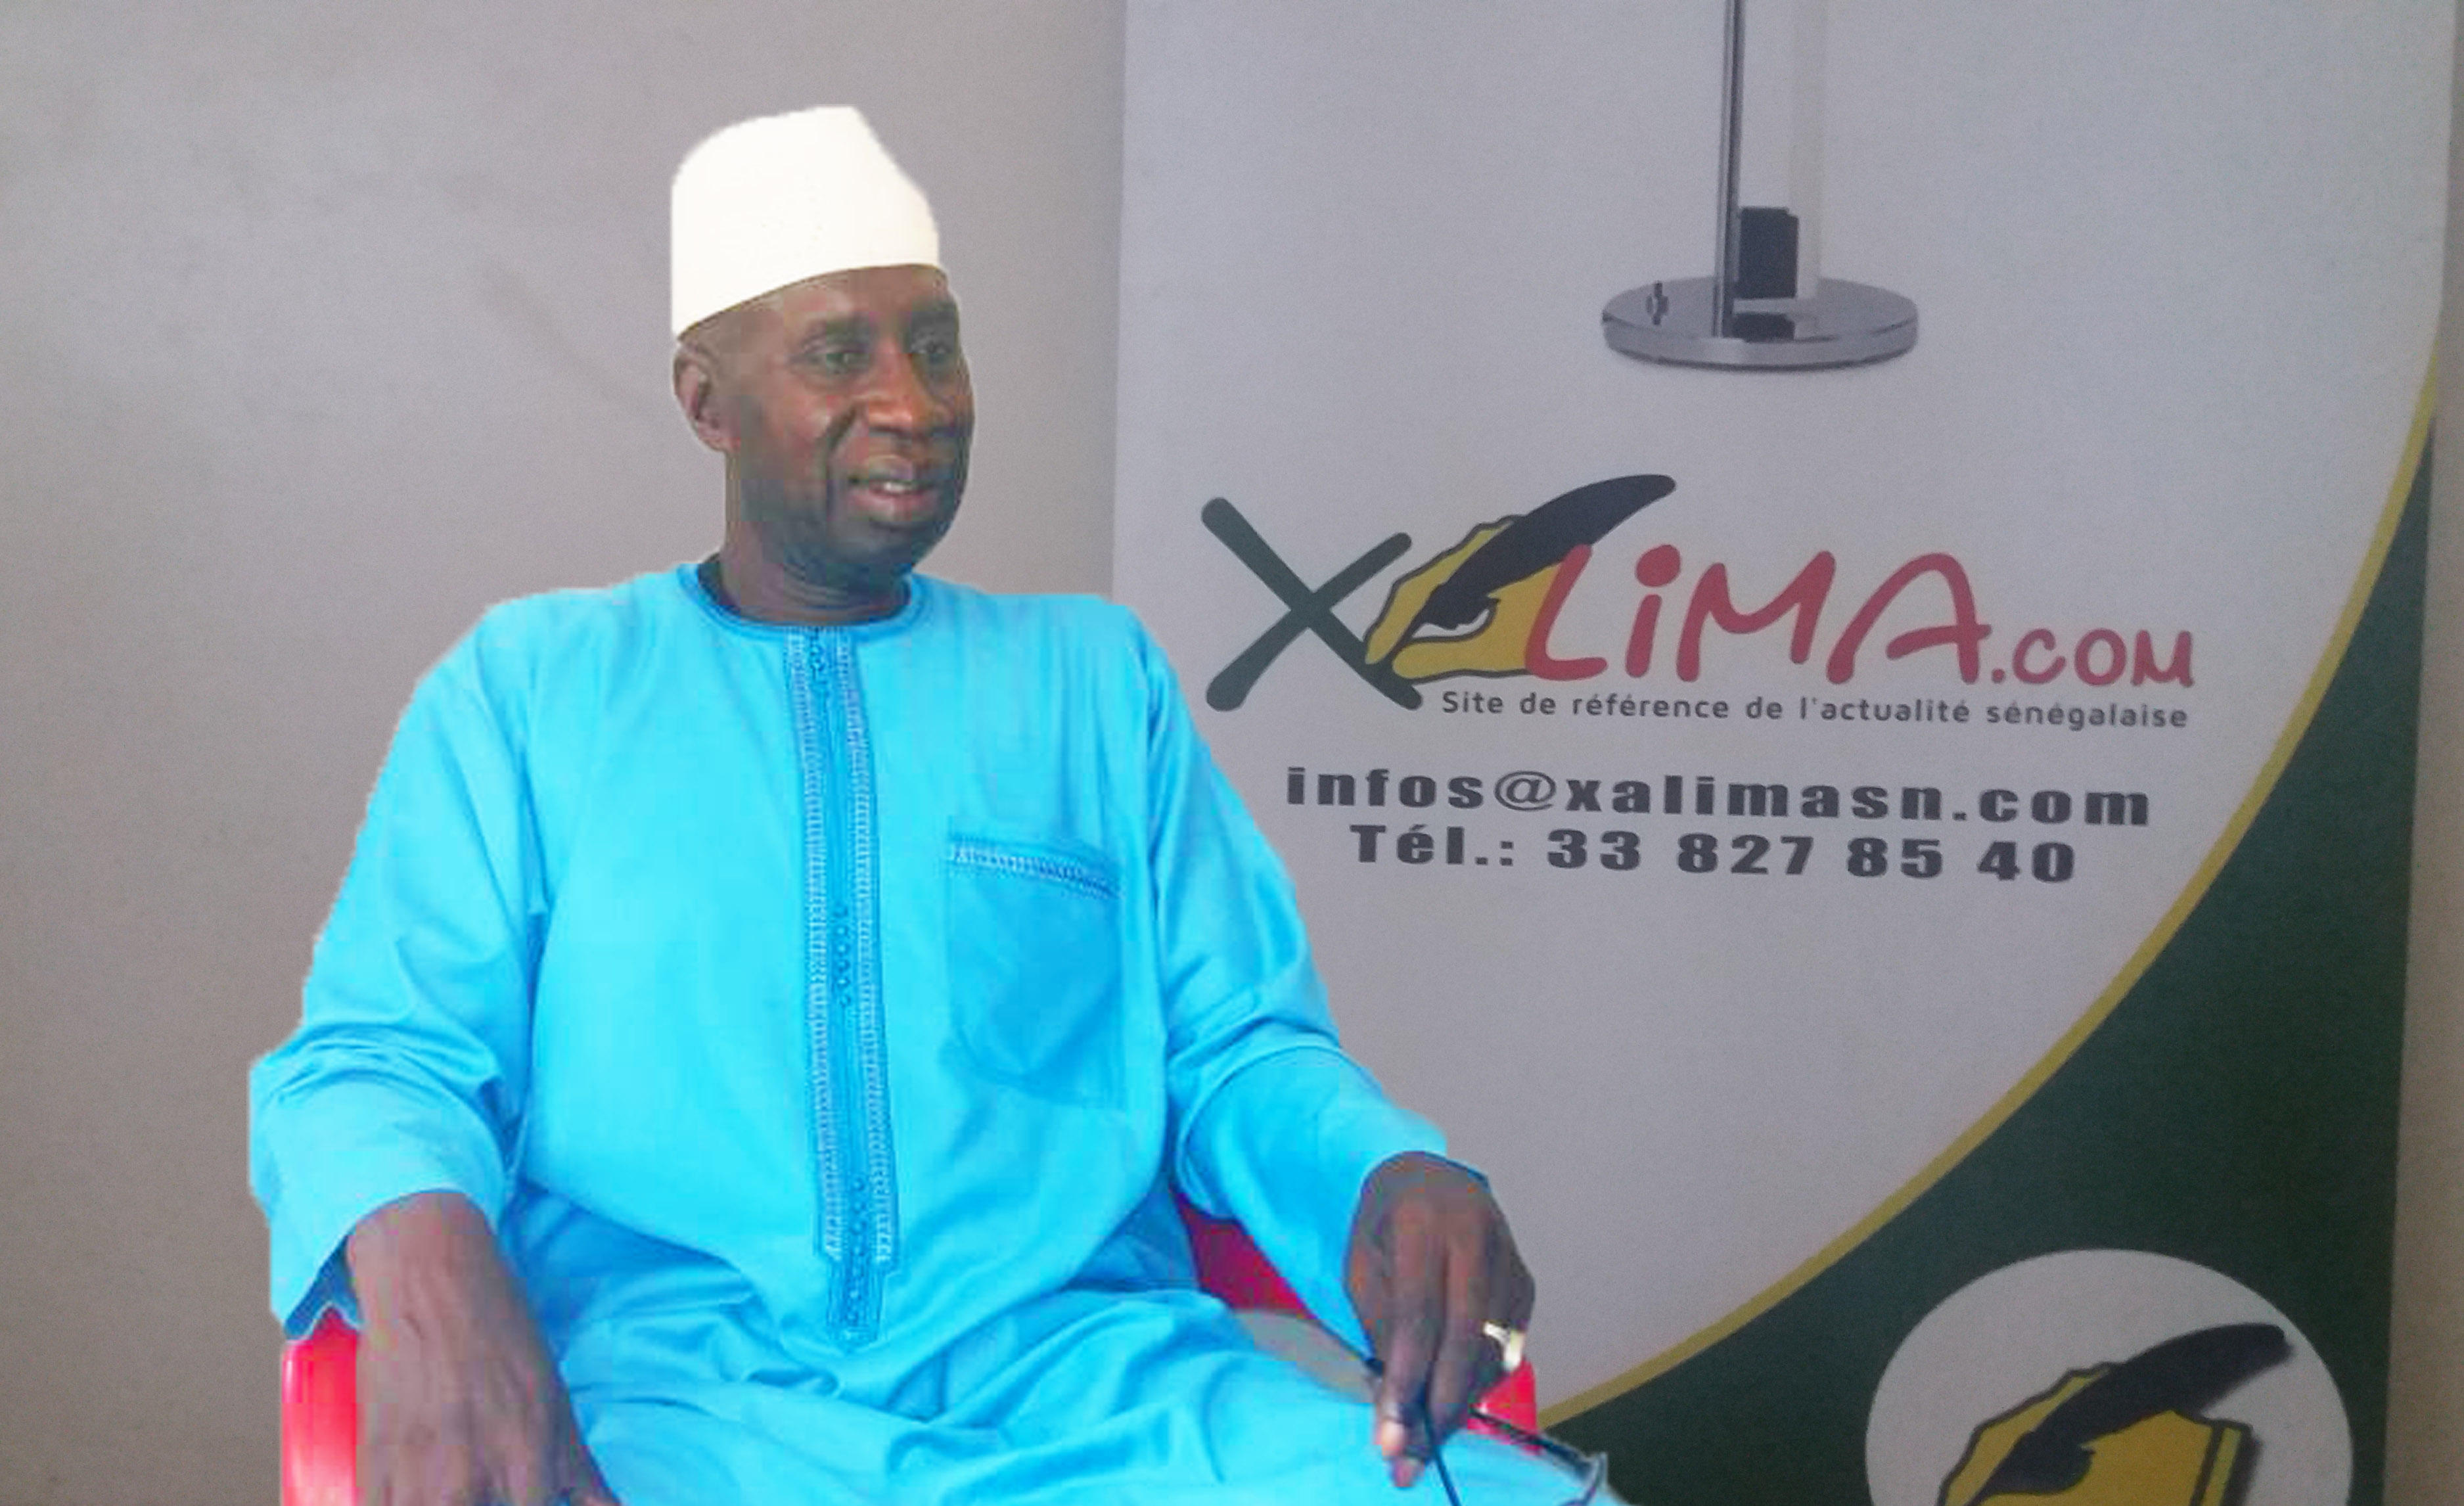 Les pi ges vicieux du parrainage par mamadou bamba for Bamba ndiaye carrelage